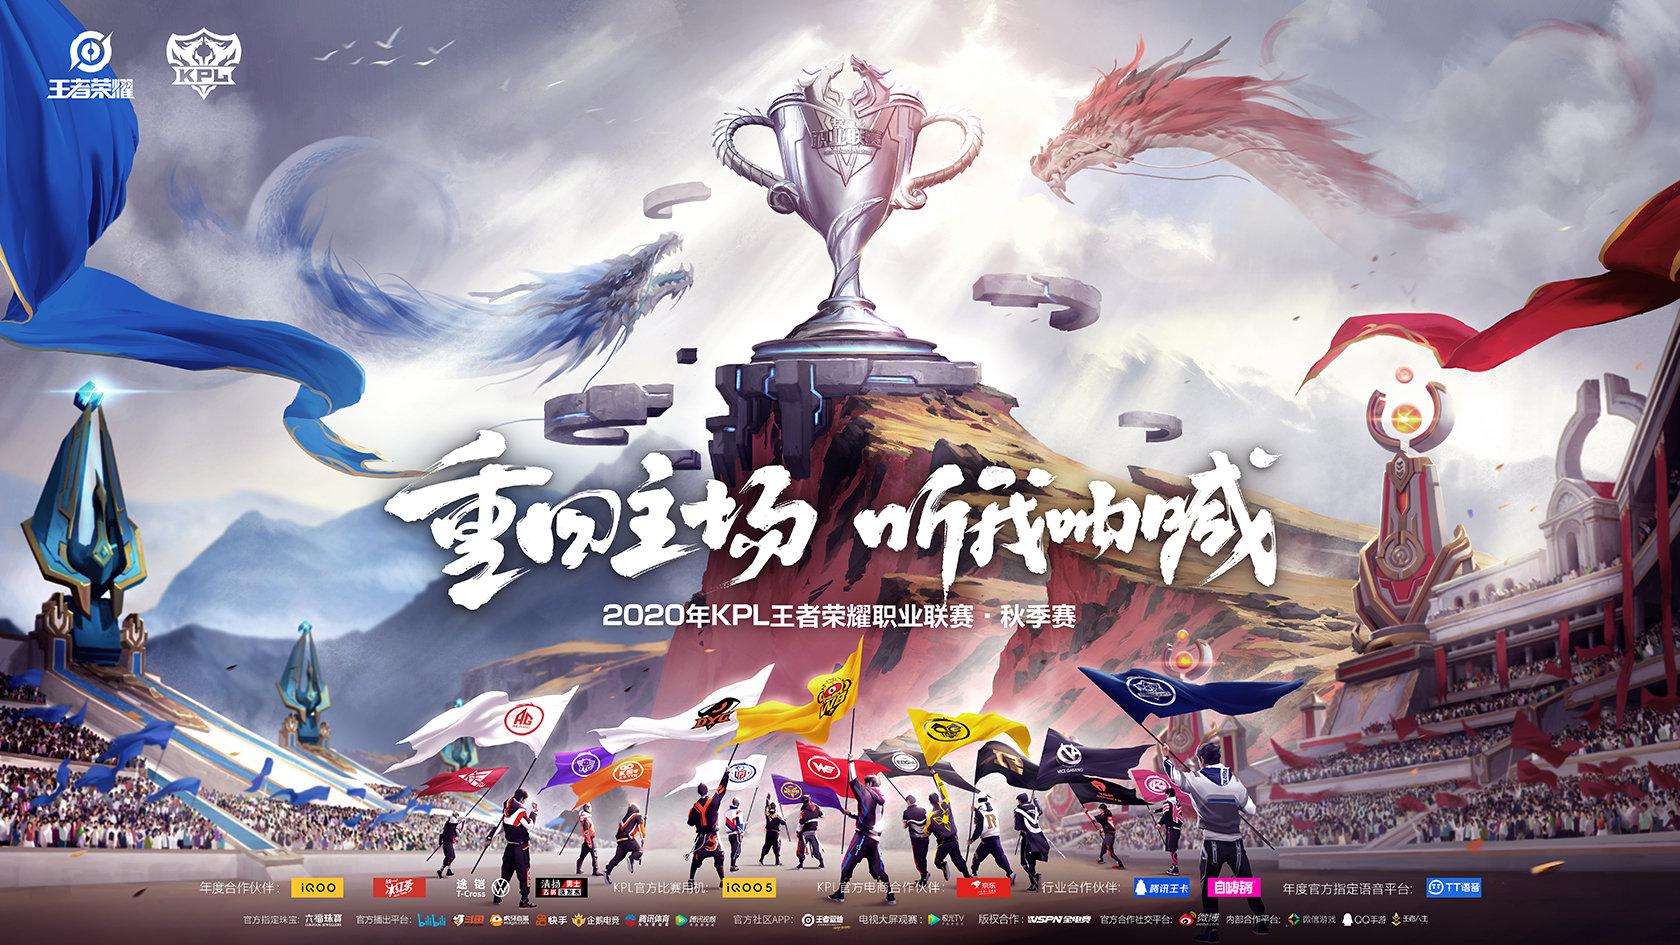 2020kpl秋季赛常规赛9月16日Hero久竞vsTTG第五场比赛视频回放